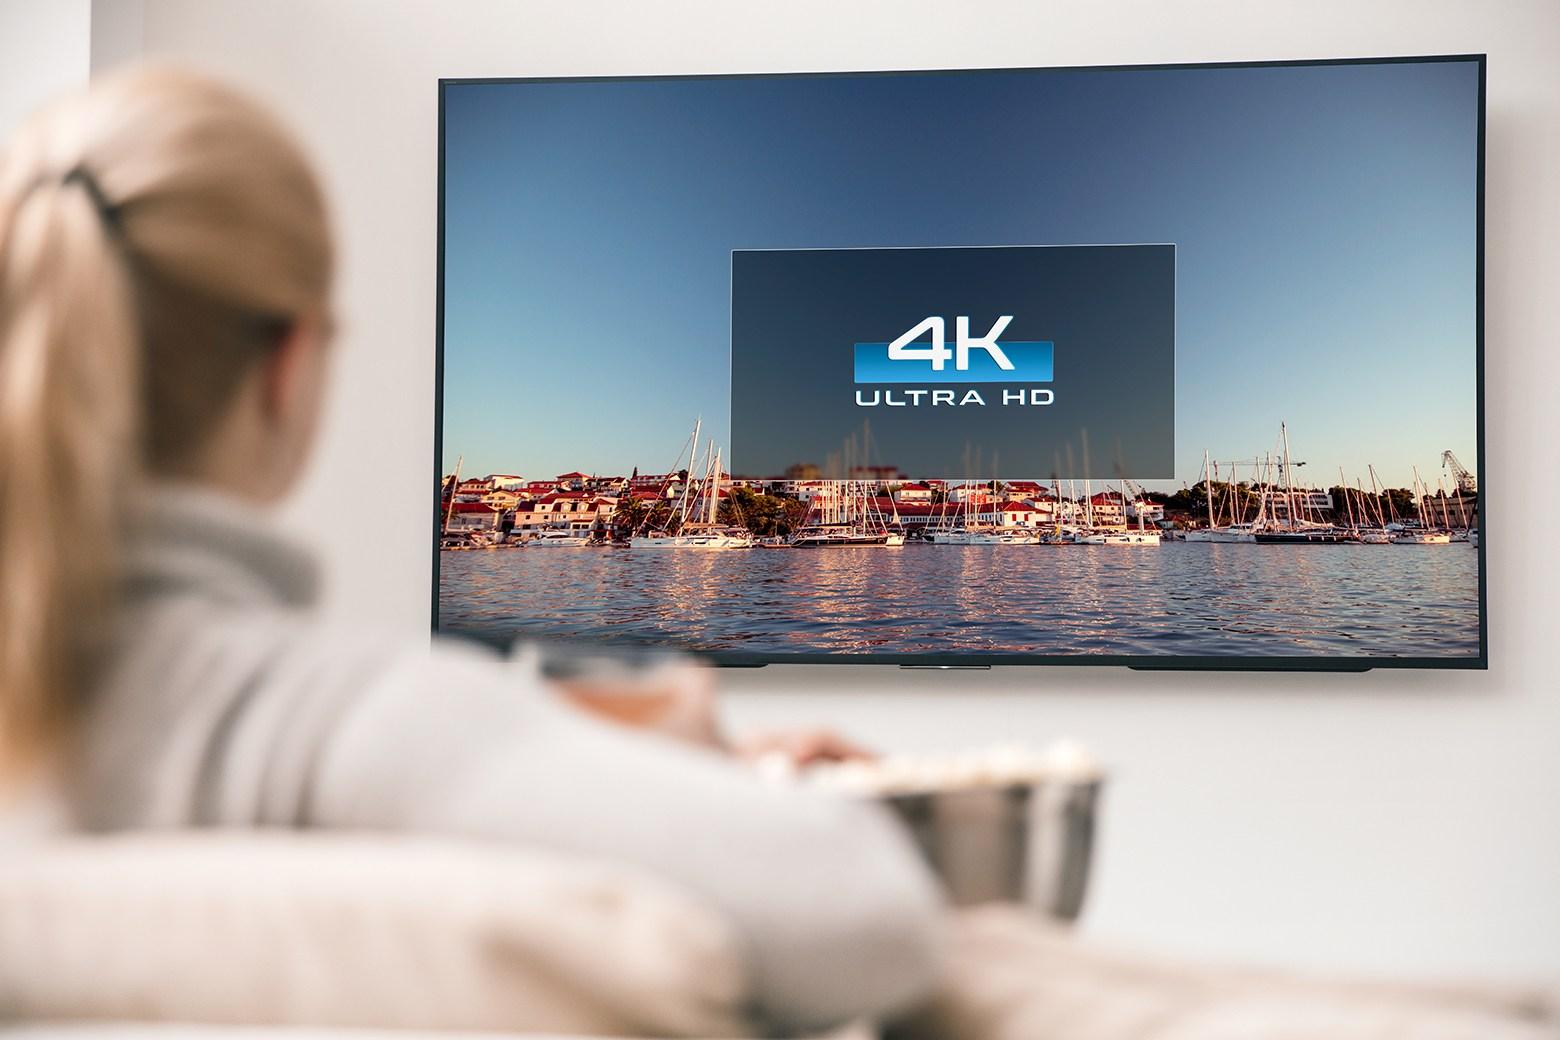 4k tv under 1k